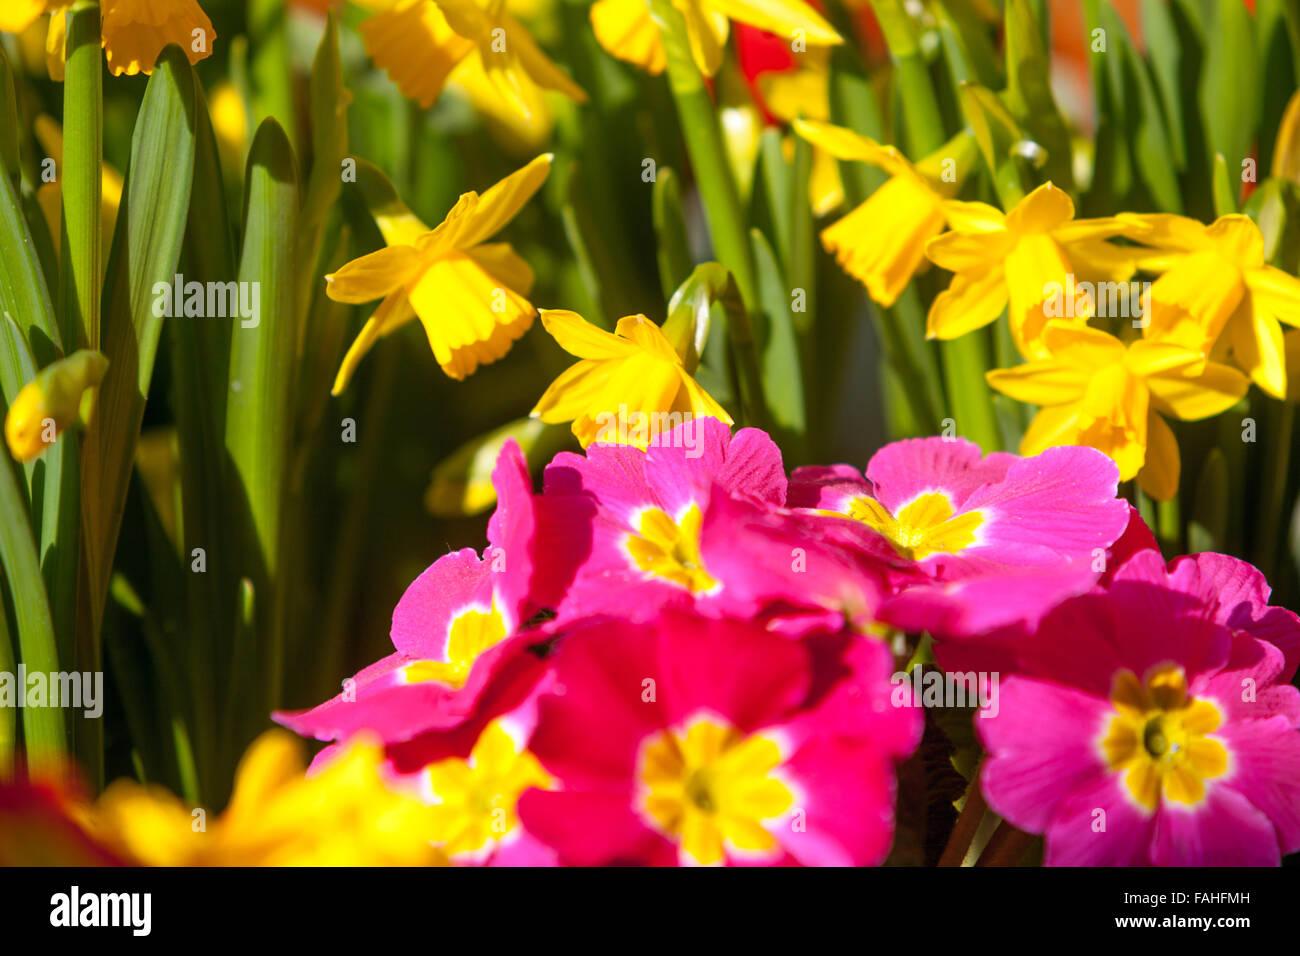 Spring Flowers Daffodils Primrose Stock Photo 92583921 Alamy